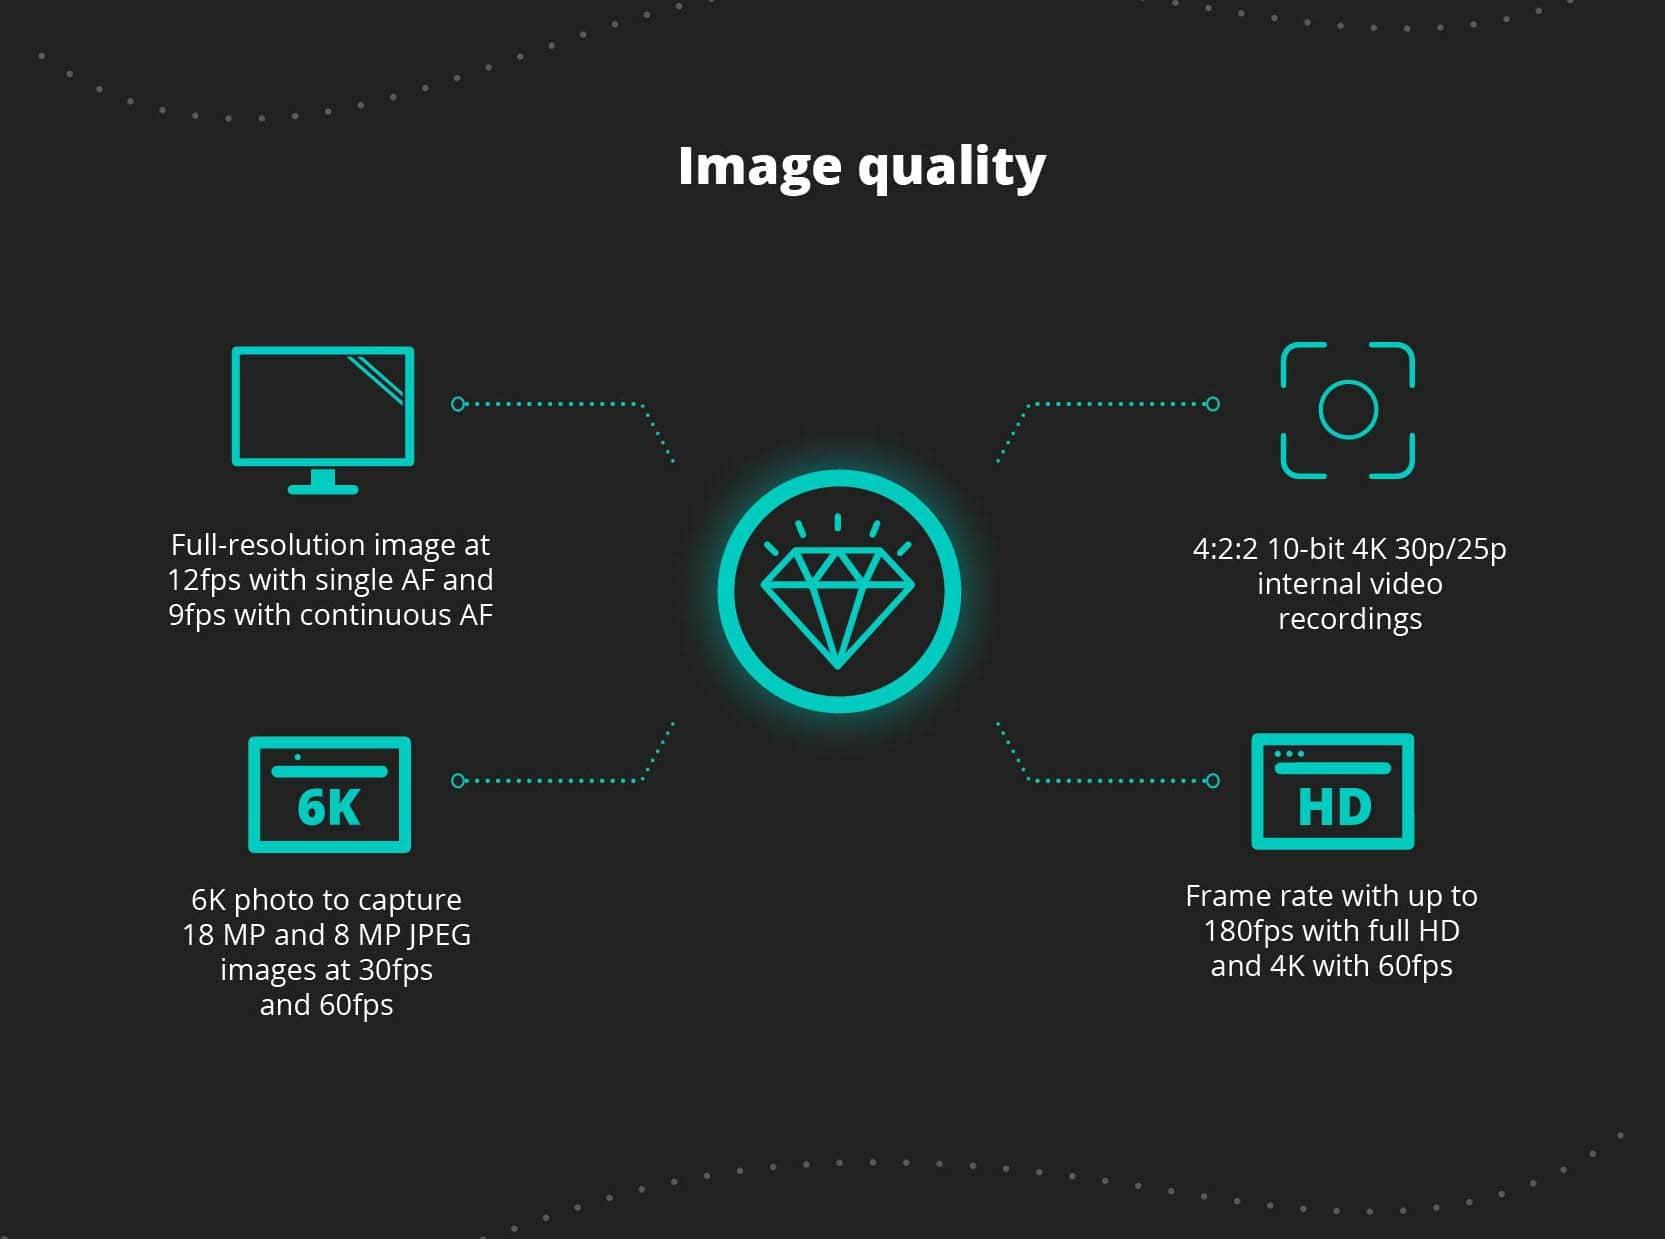 GH5 image quality, GH5 resolution, GH5 video, GH5 6K